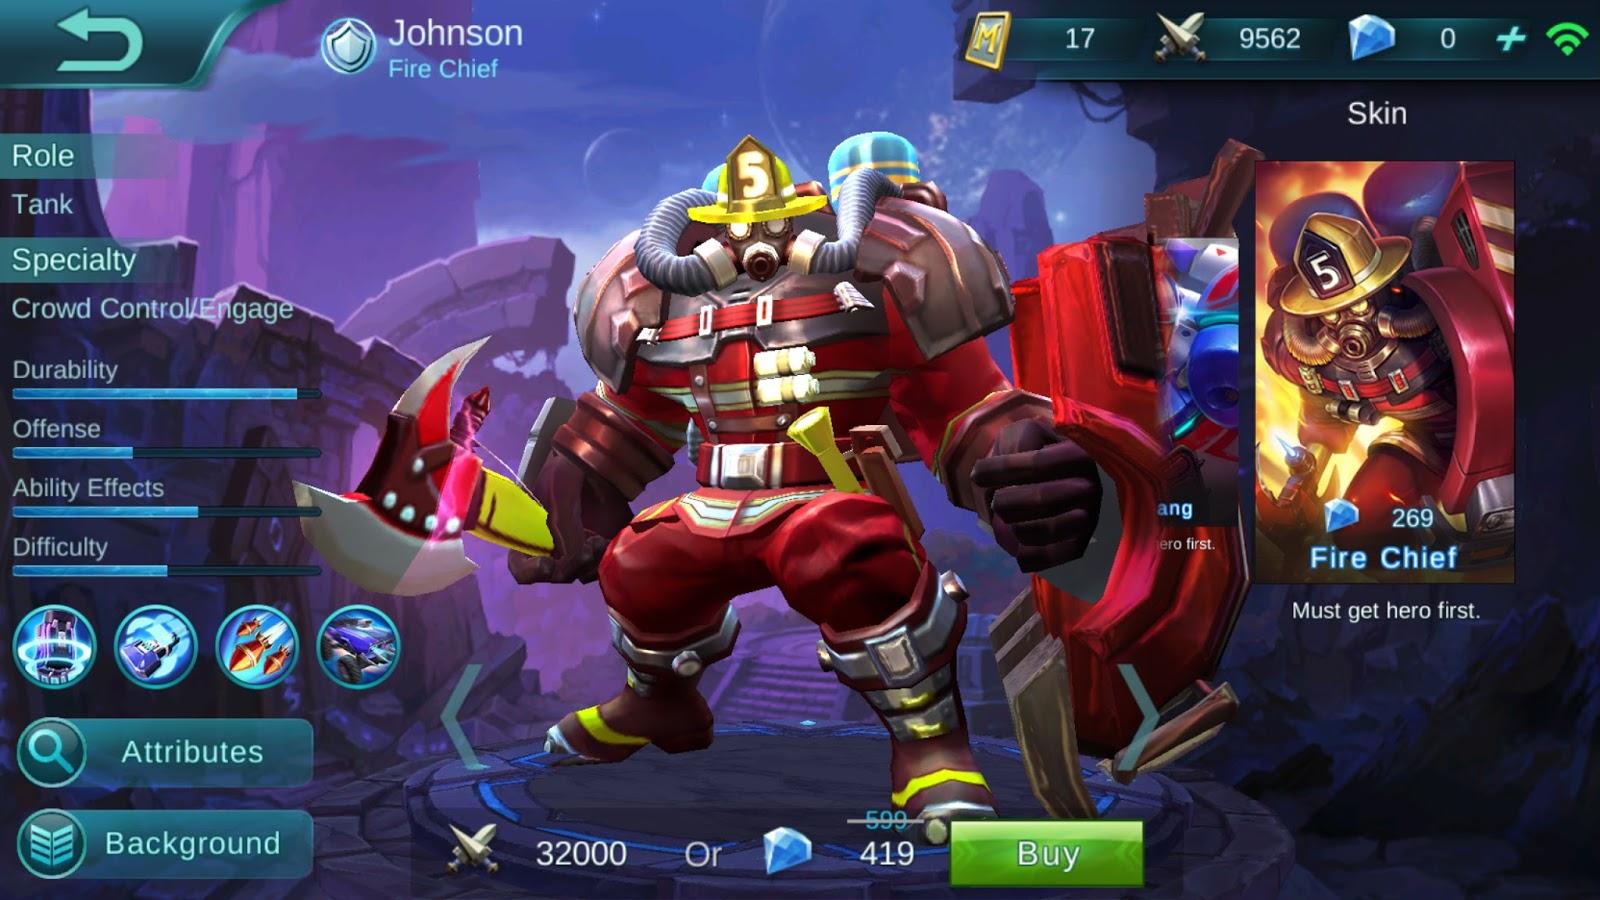 Untuk bulan ini, bahkan Johnson di Op oleh pihak Mobile legend yang mengganti skill dua Johnson yang cukup merepotkan lawan yakni Stone setelah melempar kampak pemadam kebakaran ke lawan ditambah durability yang tinggi membuat Tank ini jadi salah satu Hero yang tidak pernah hilang bettle level Epic.